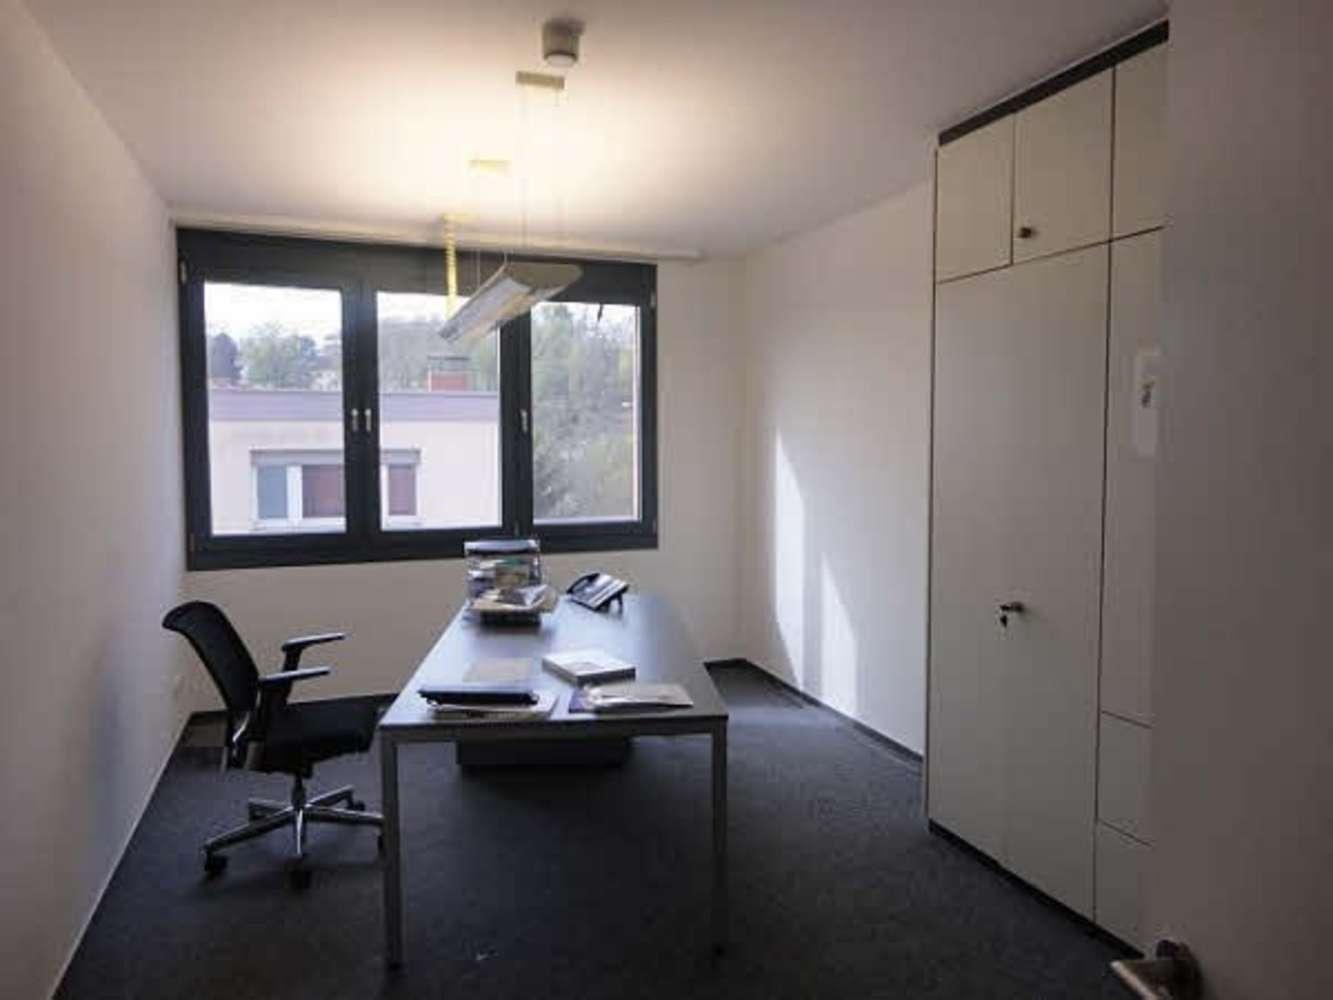 Büros Frankfurt am main, 60599 - Büro - Frankfurt am Main, Sachsenhausen - F1443 - 9405098